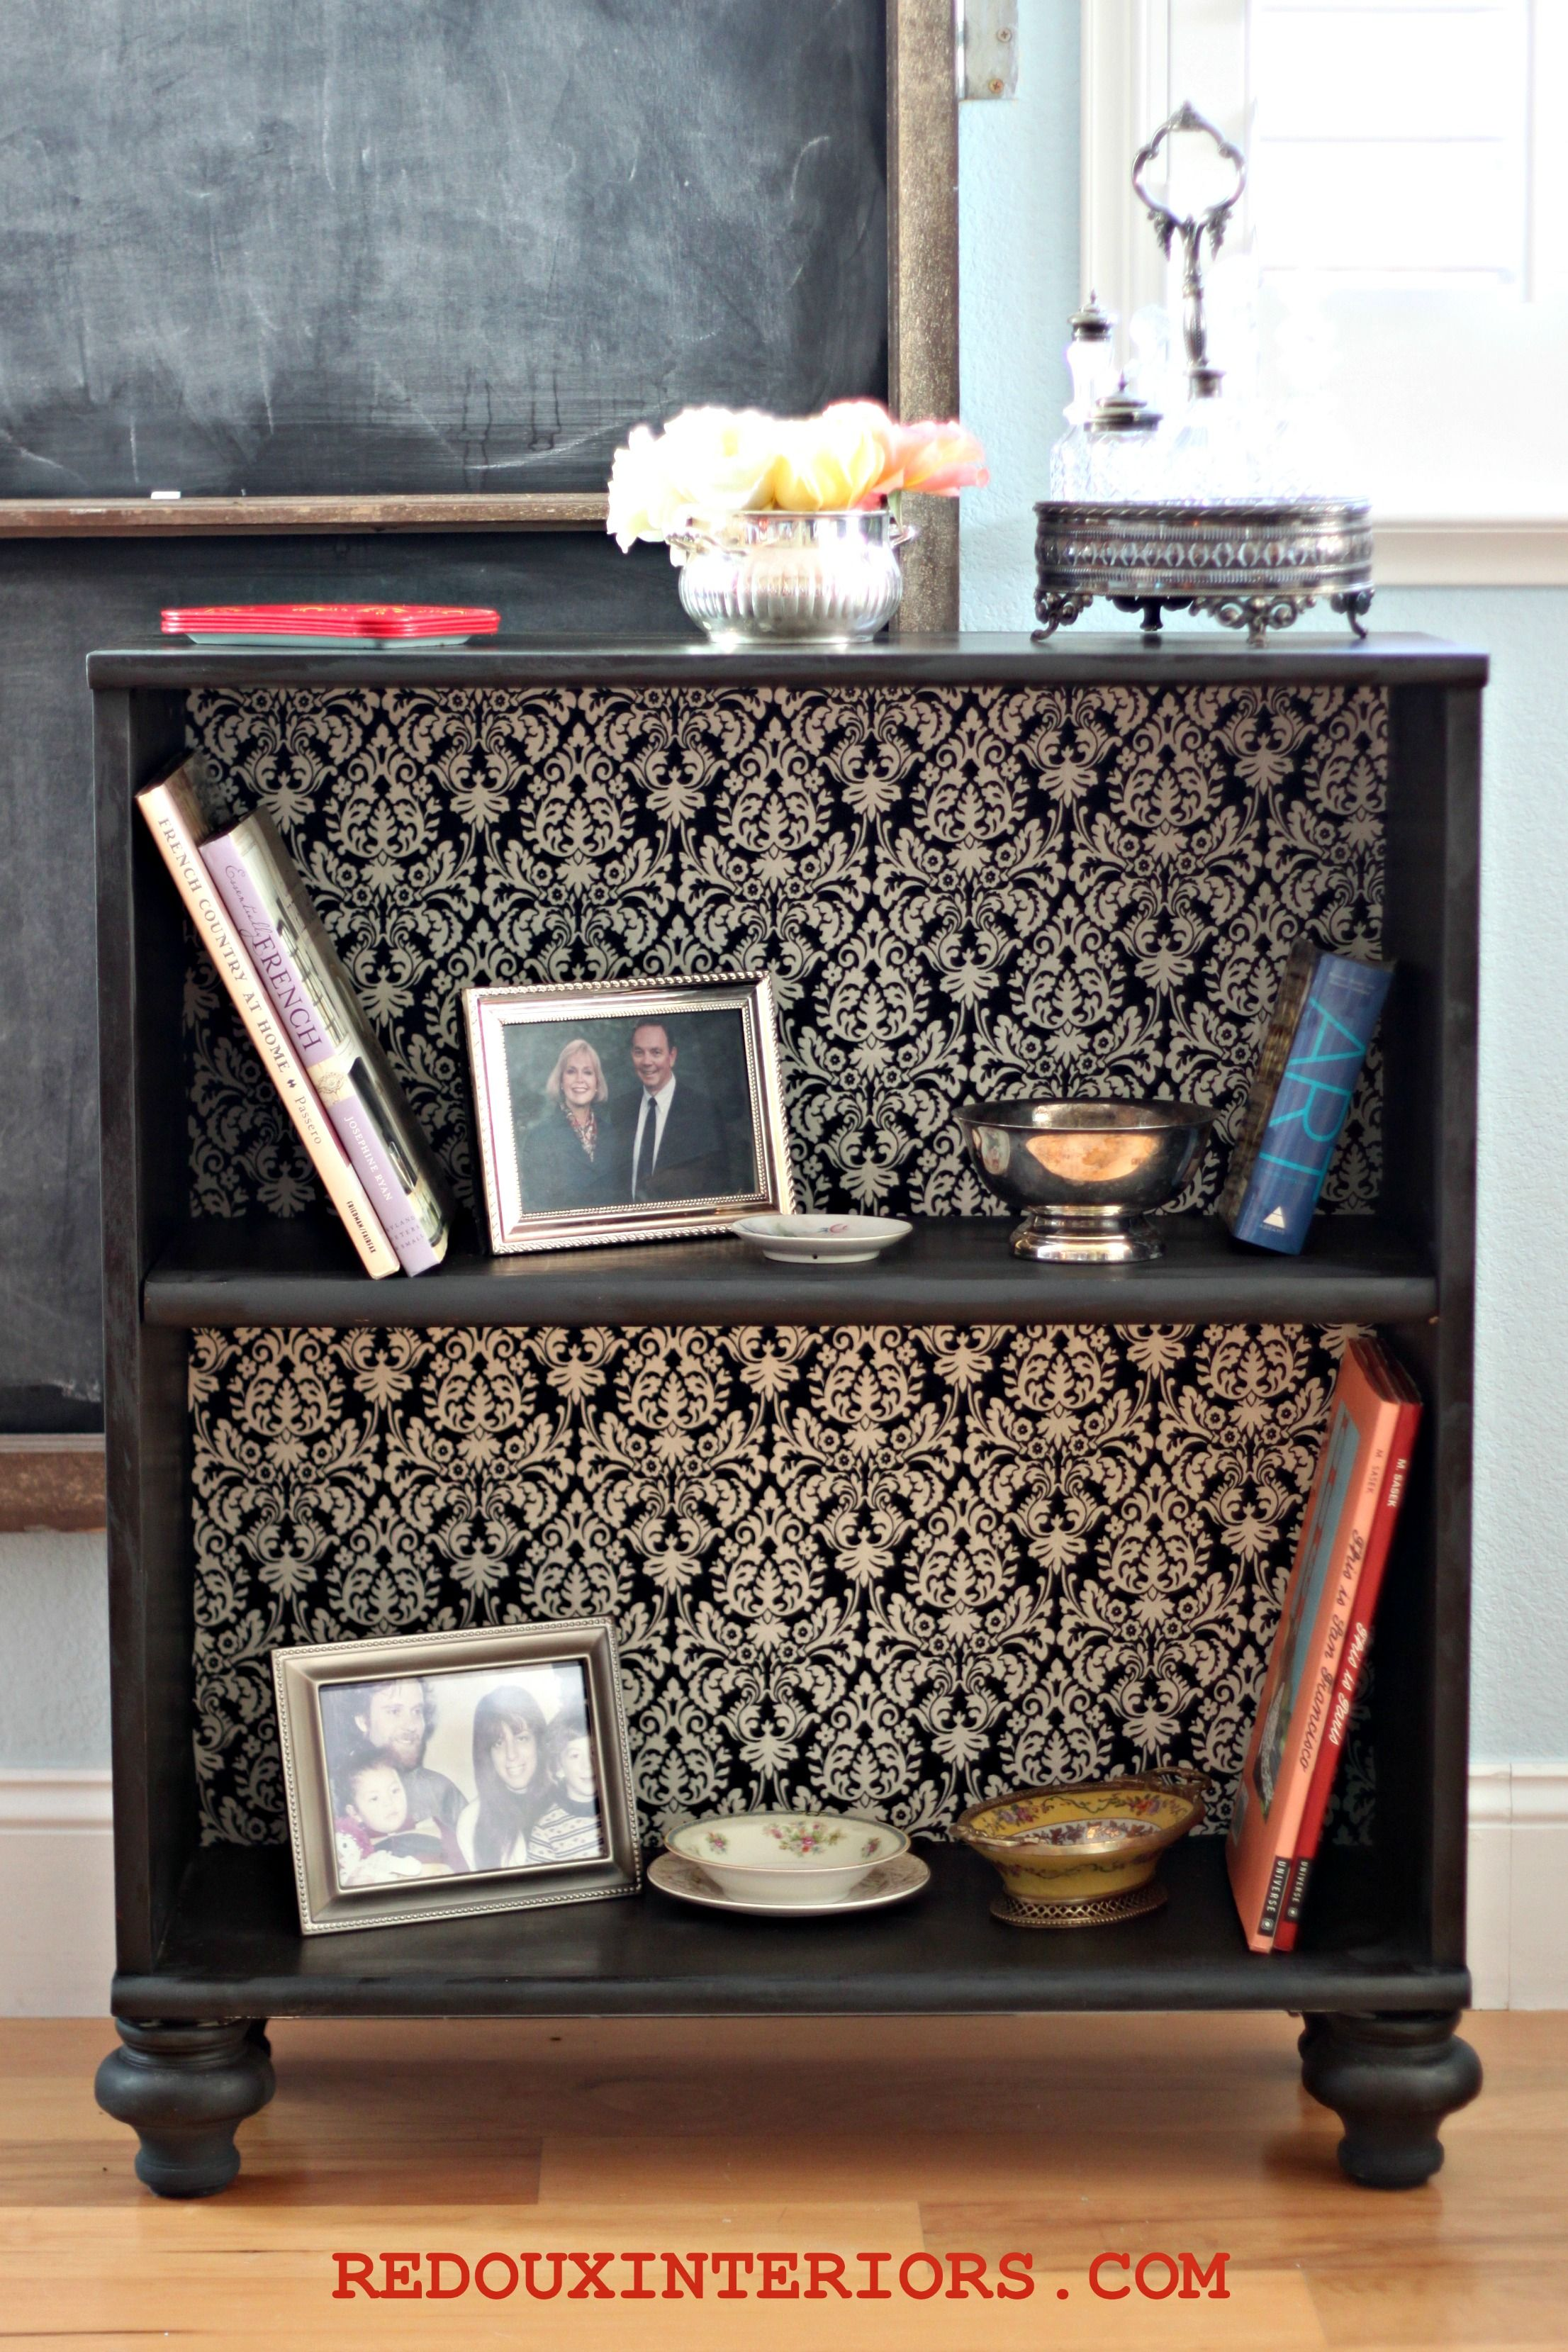 upgrade a plain bookshelf add feet and wallpaper or bead board